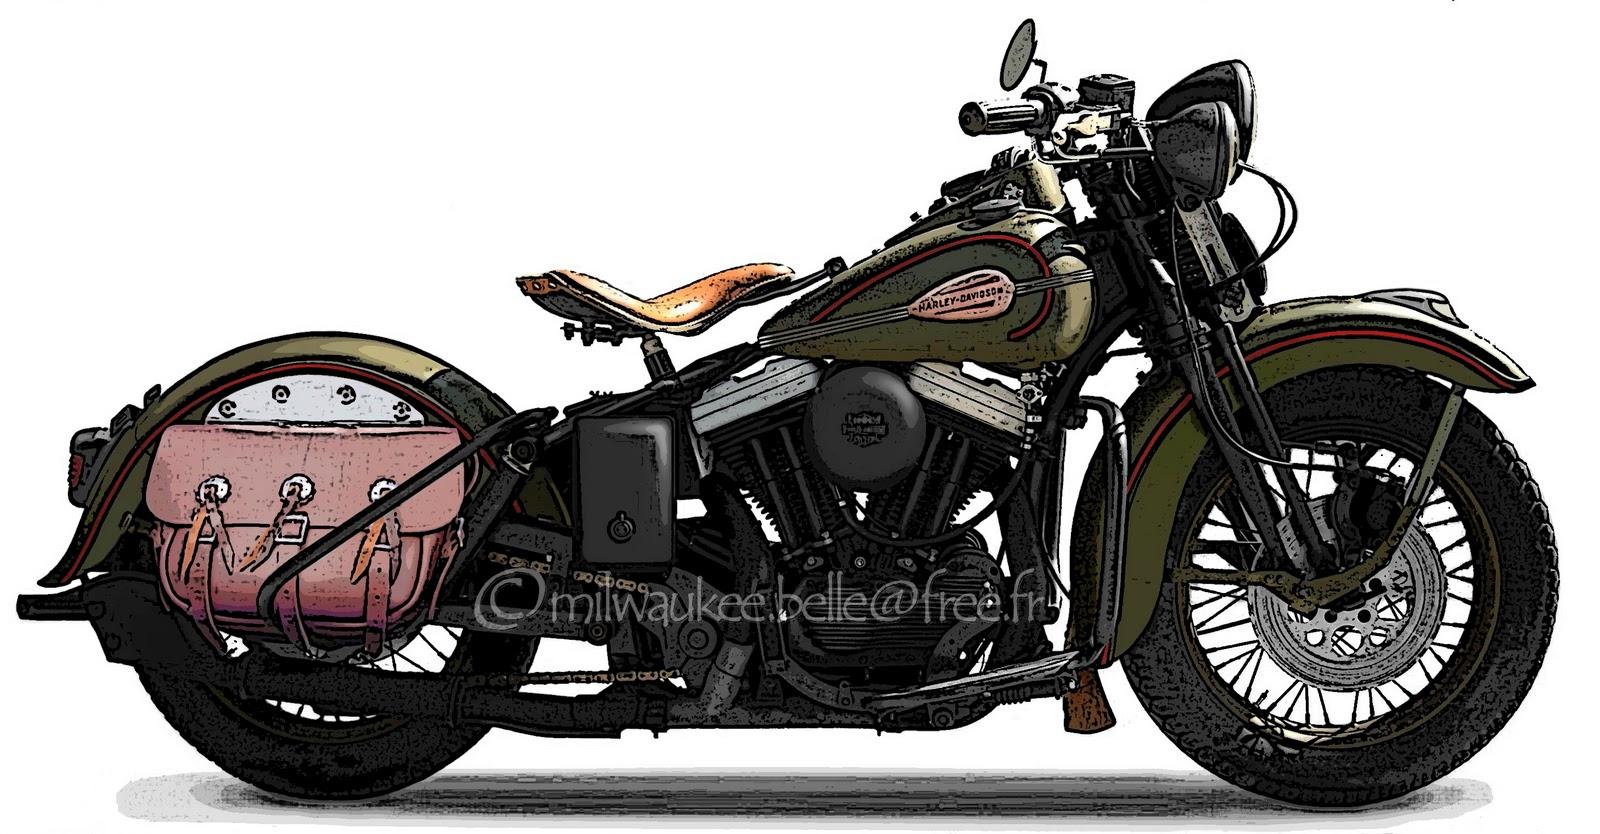 Harley Davidson 883 XWL WARBOY